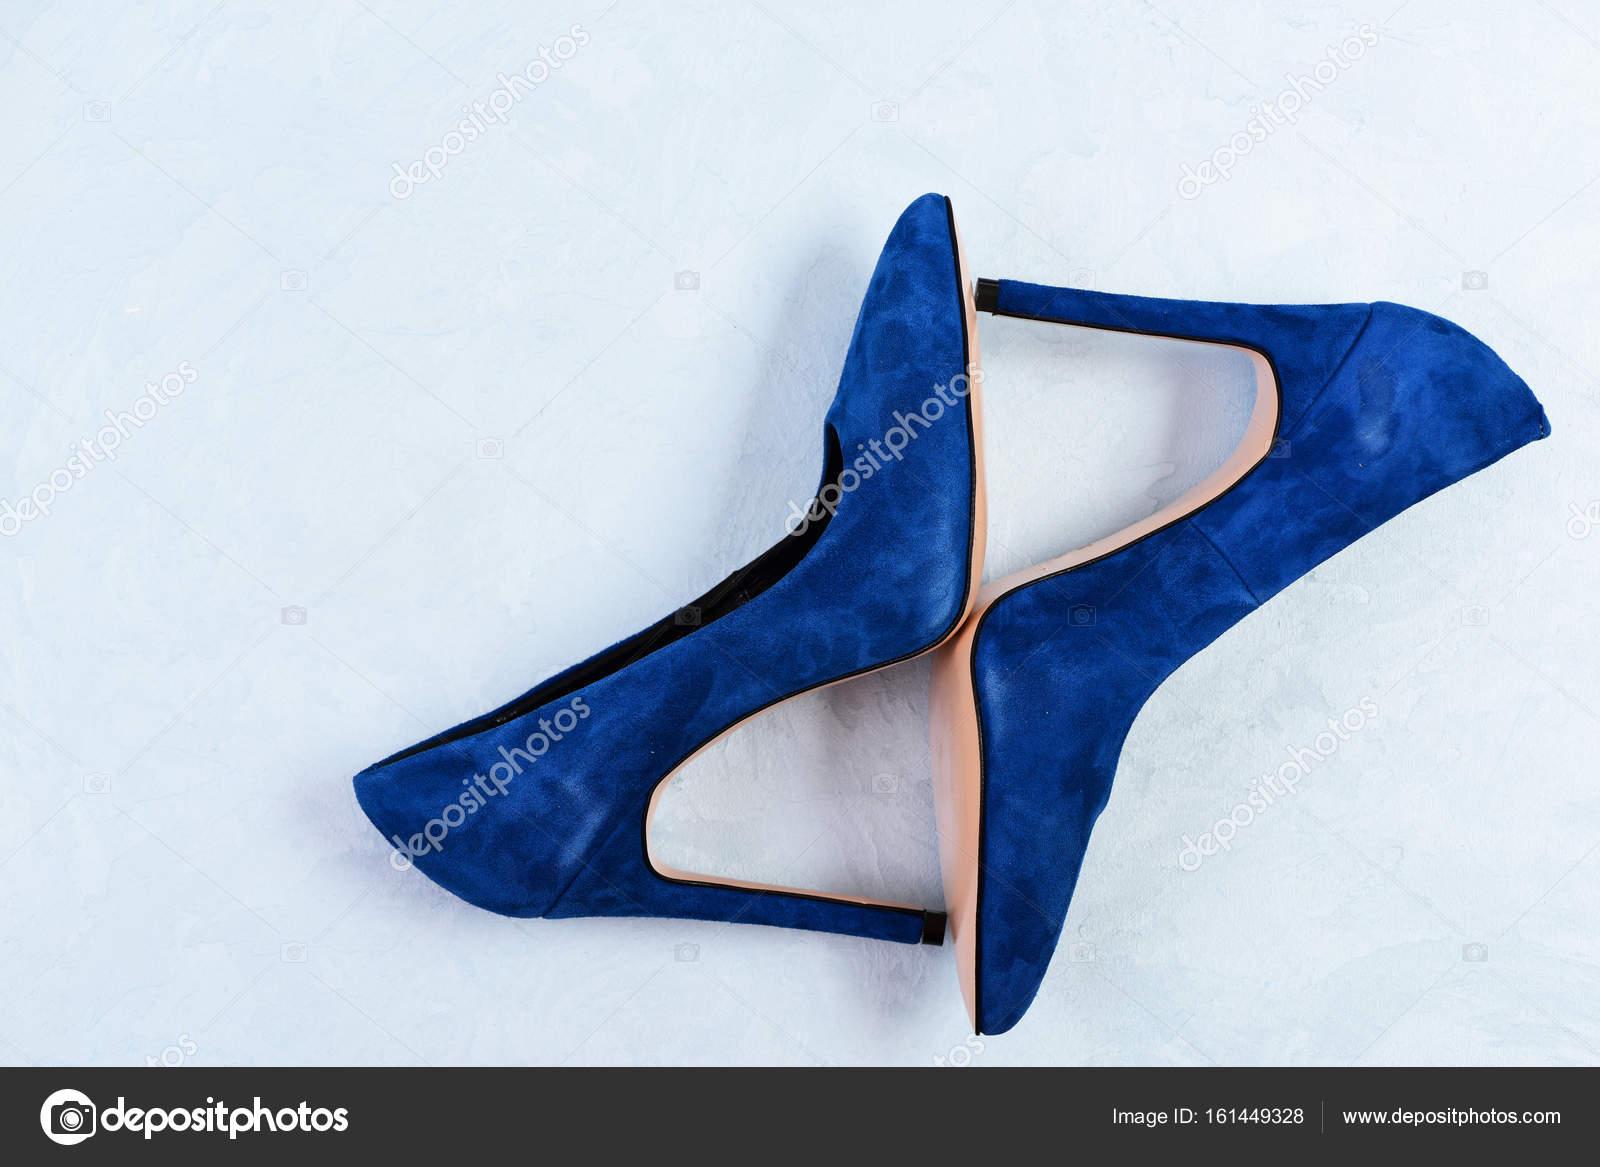 3569d86588 Sapatos de salto alto azul sobre fundo azul claro. Sapatos femininos —  Fotografia de Stock